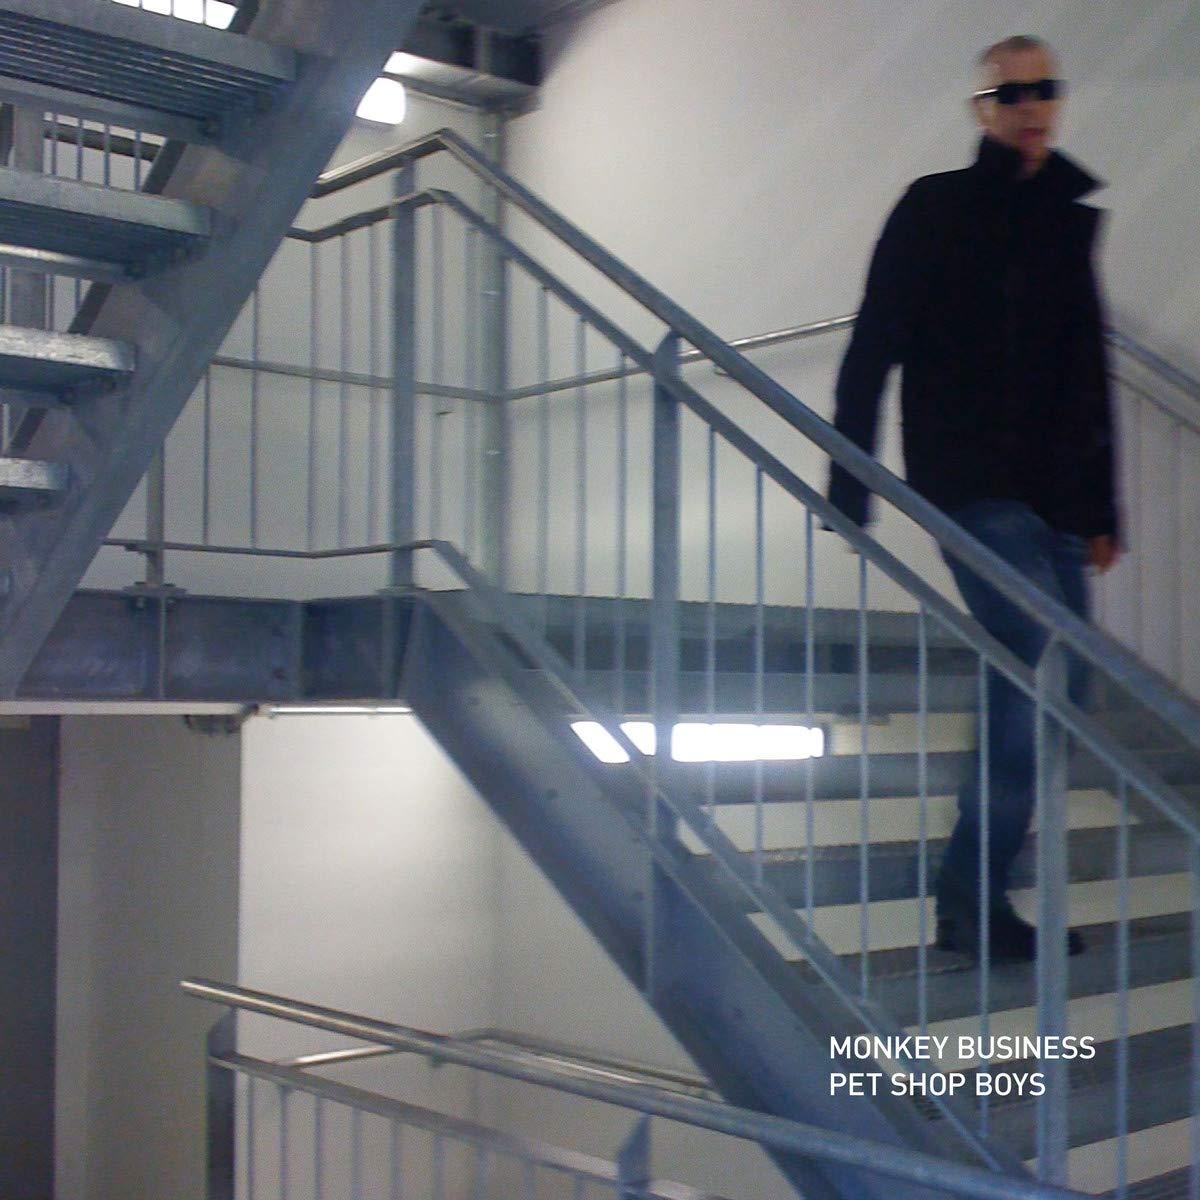 Pet Shop Boys – Monkey Business (2020) [FLAC]